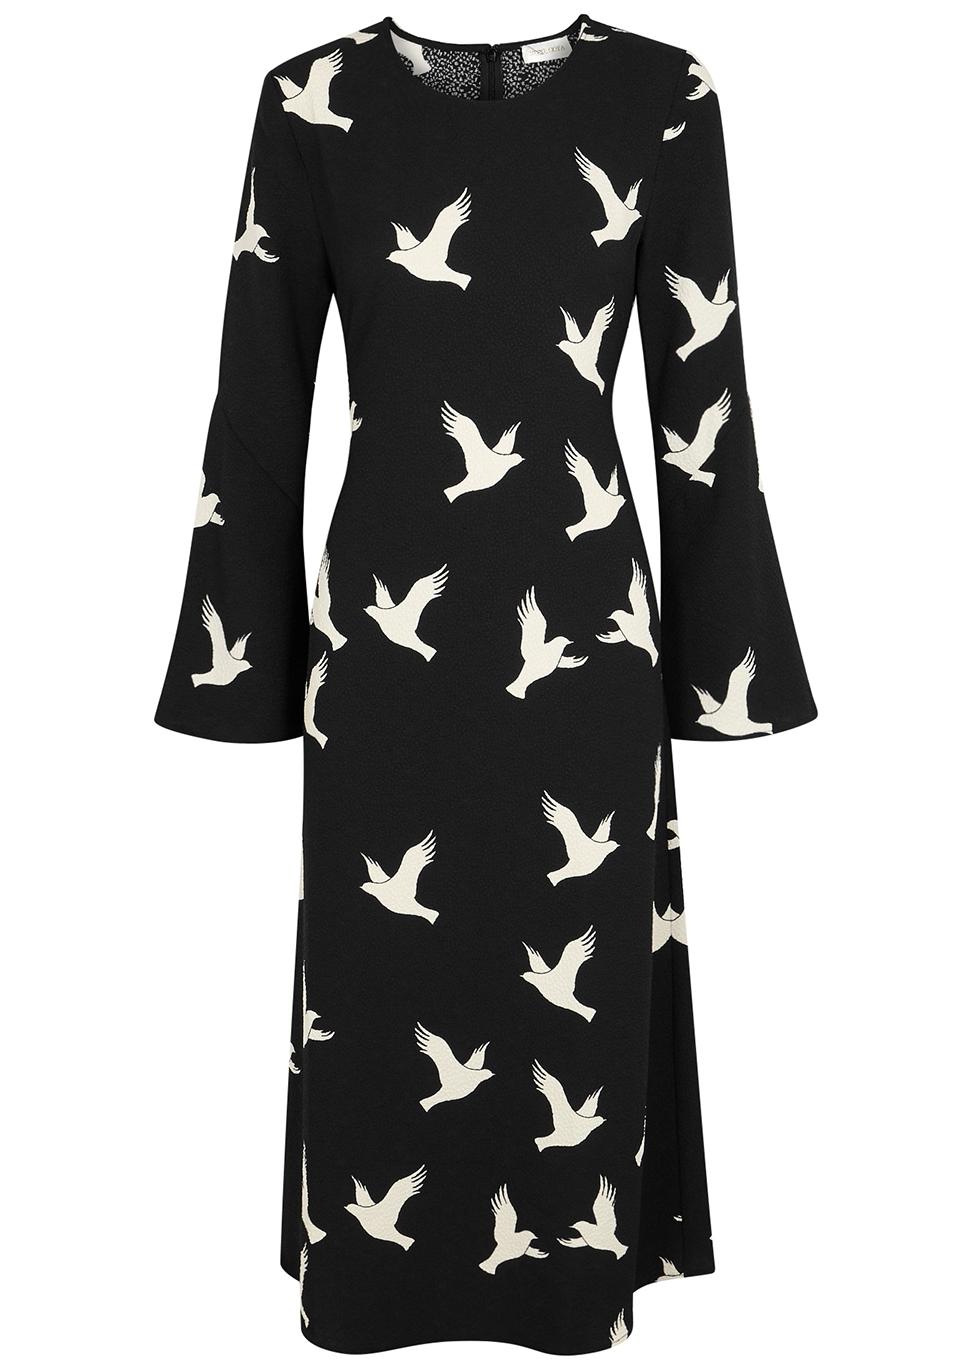 Clara Dove Print Midi Dress in Black And White